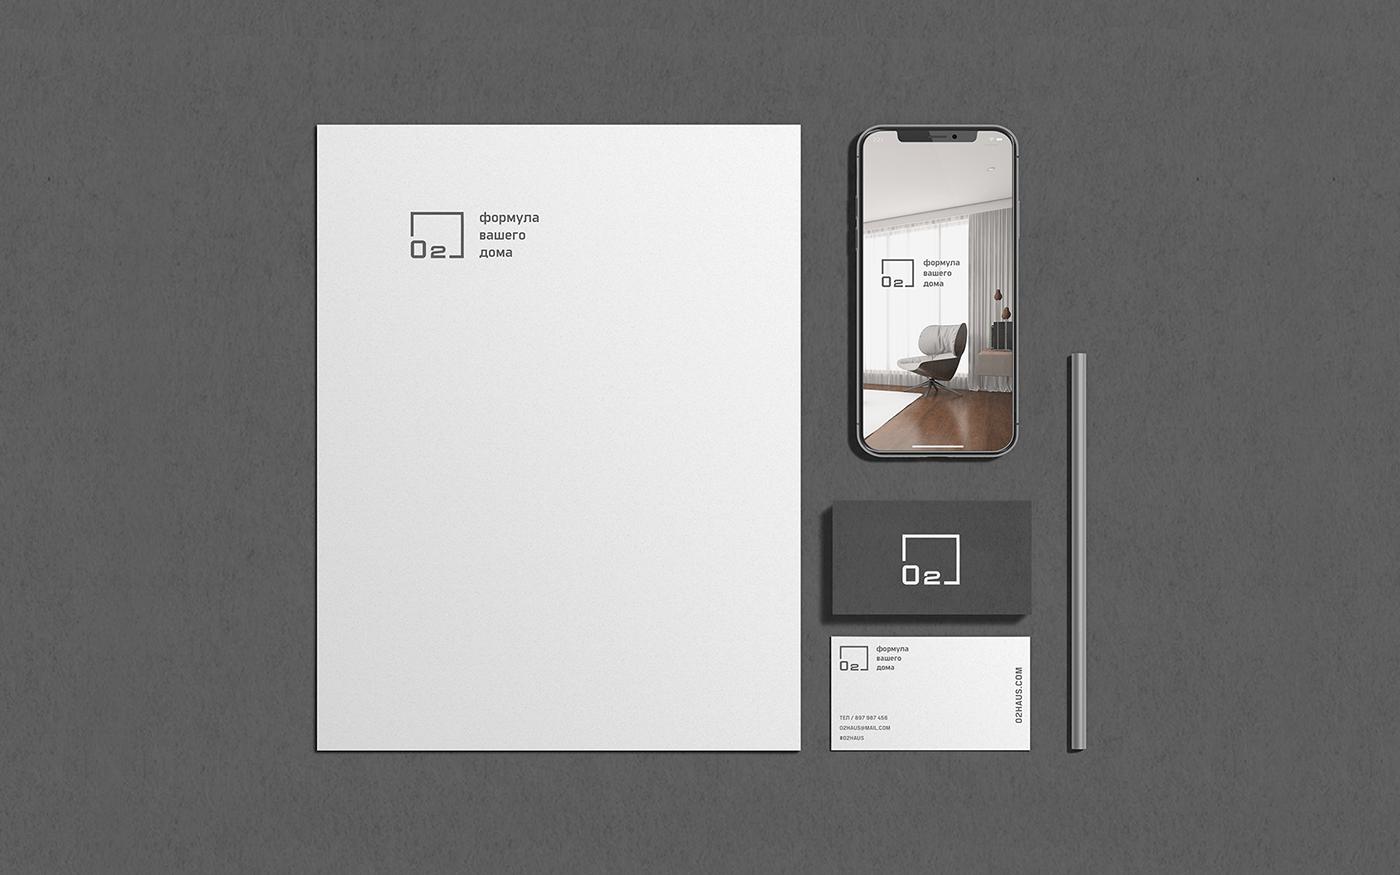 architecture brand identity colorplan gray home identity Interior Logotype minimalistic Scandinavian